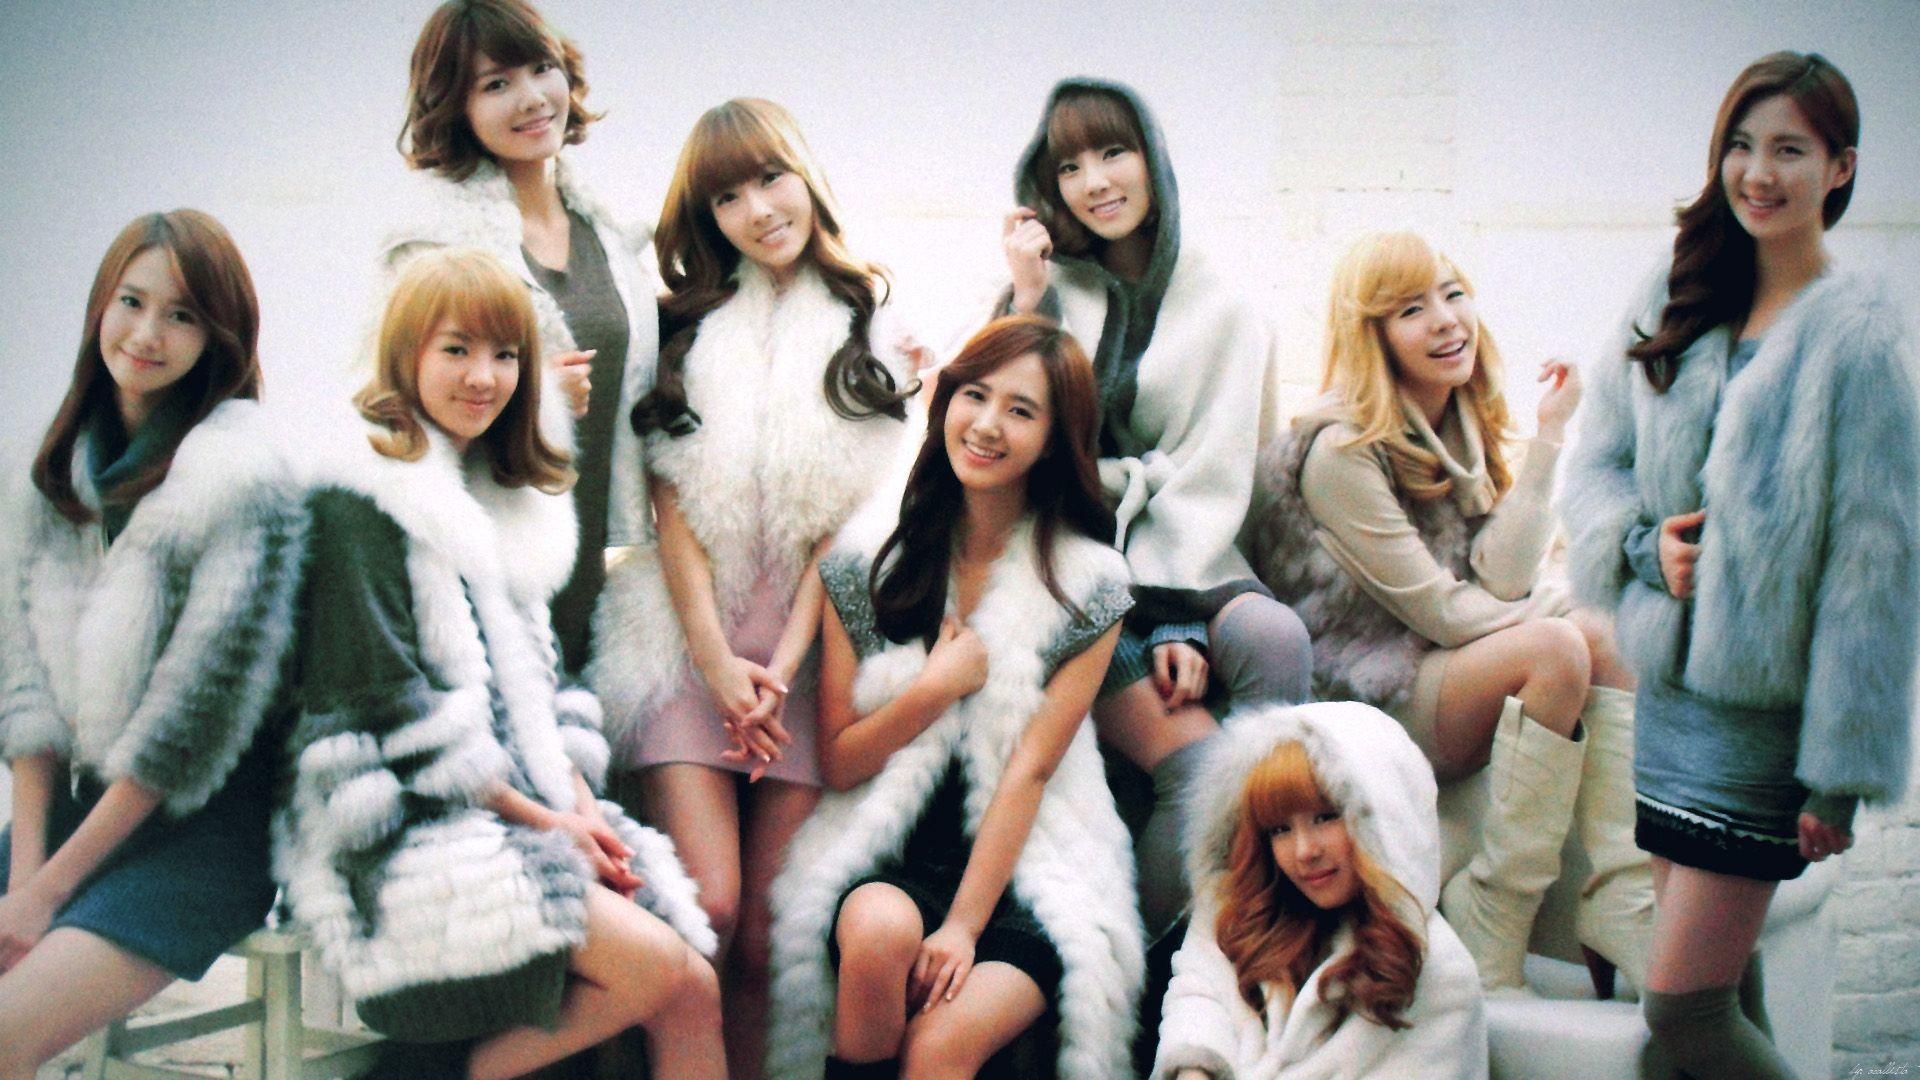 SNSD Girls Generation Wallpaper HD 소녀시대/少女時代 1024×768 Snsd Wallpaper (